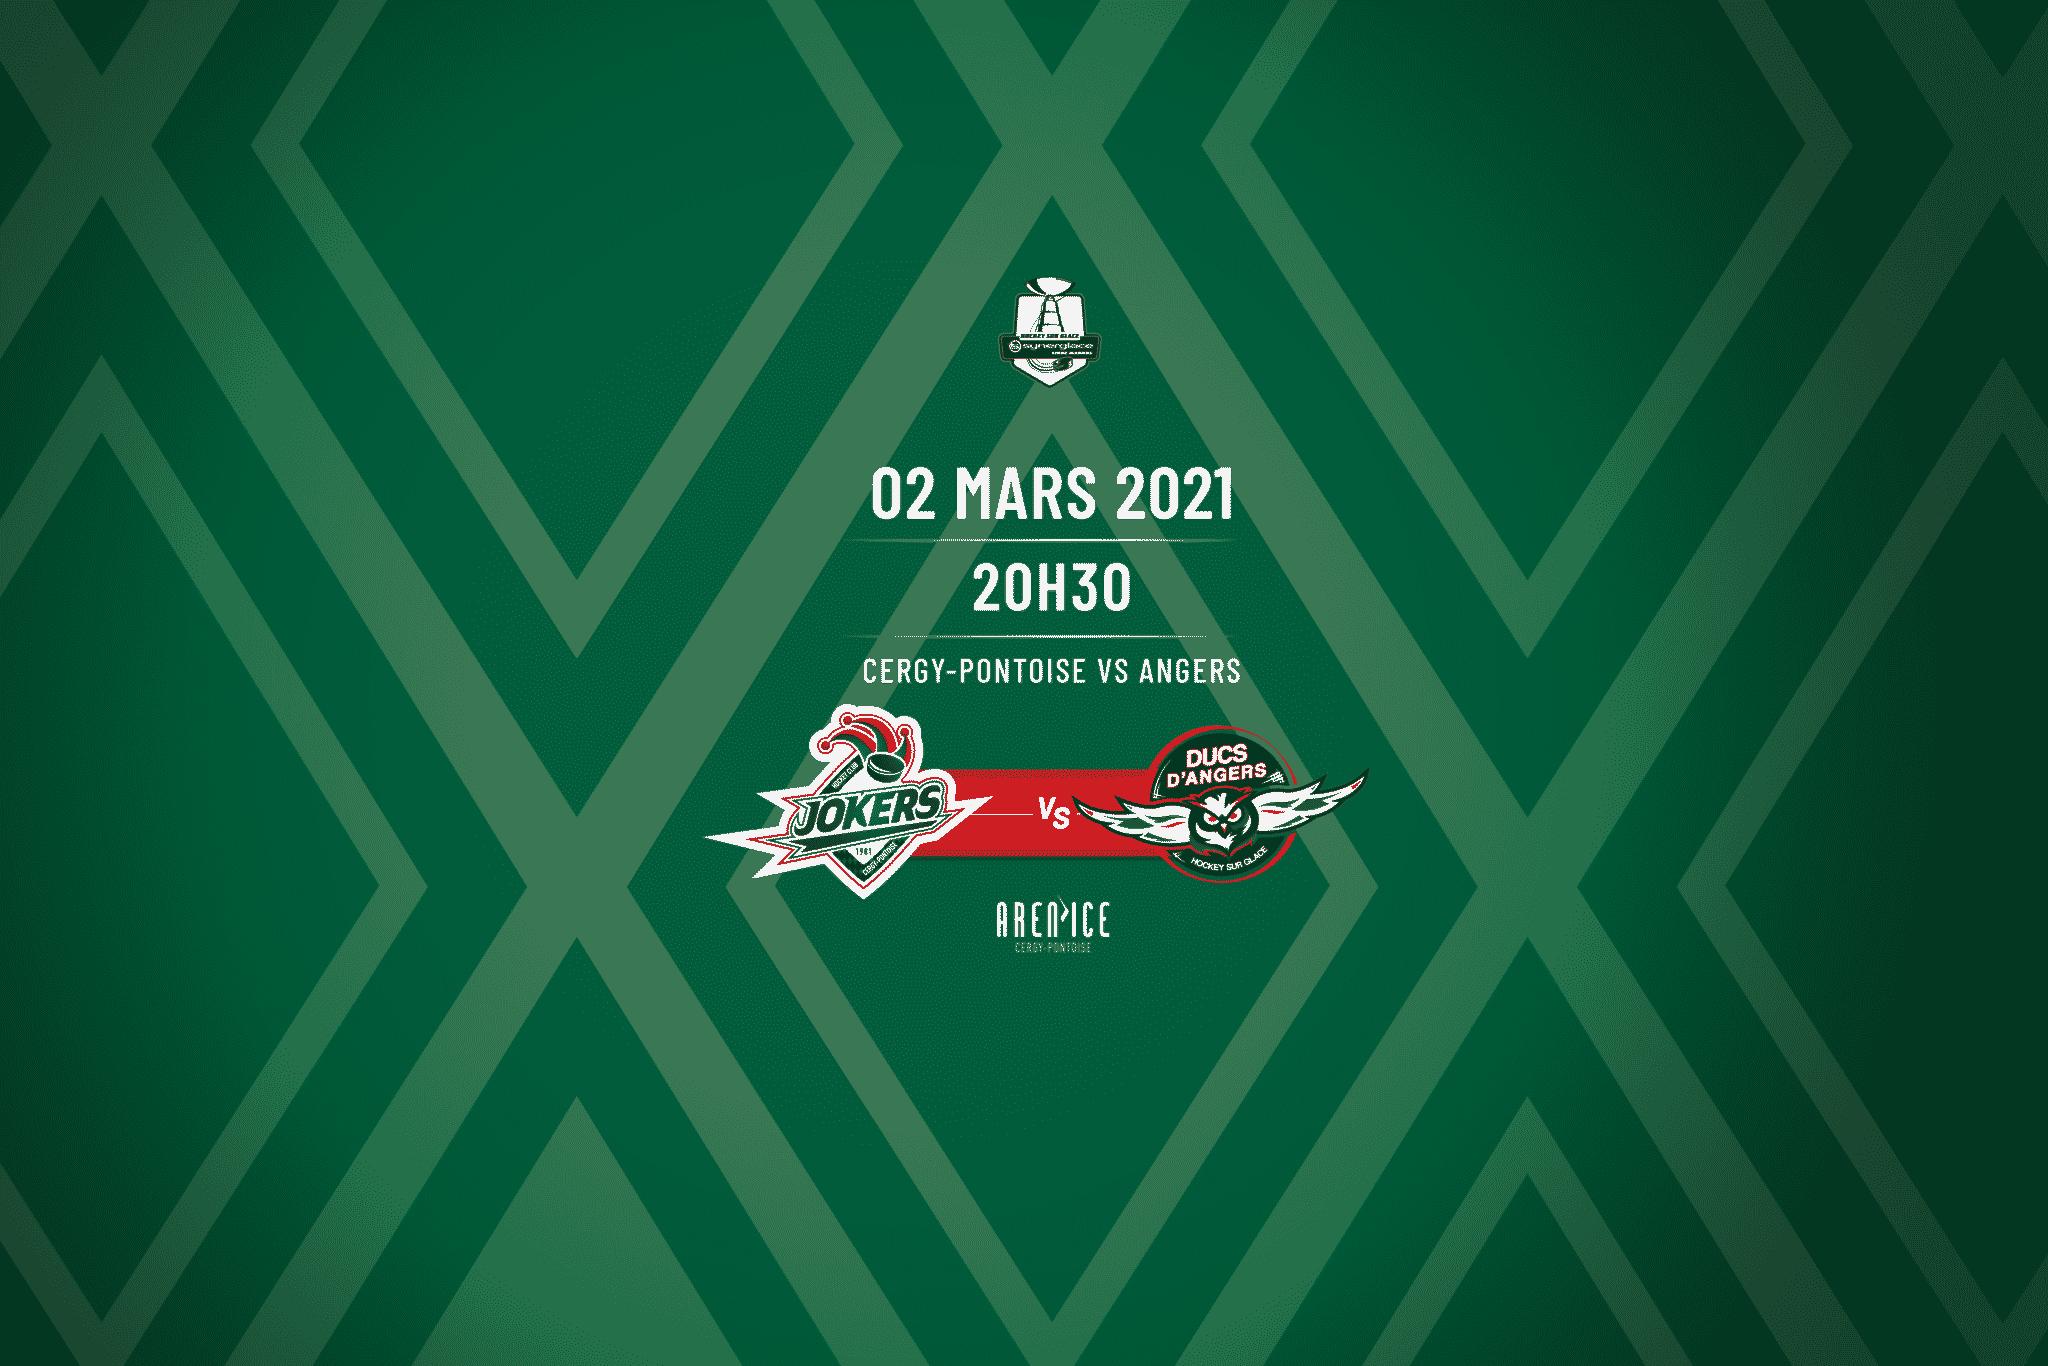 Cergy-Pontoise vs Angers - 020321